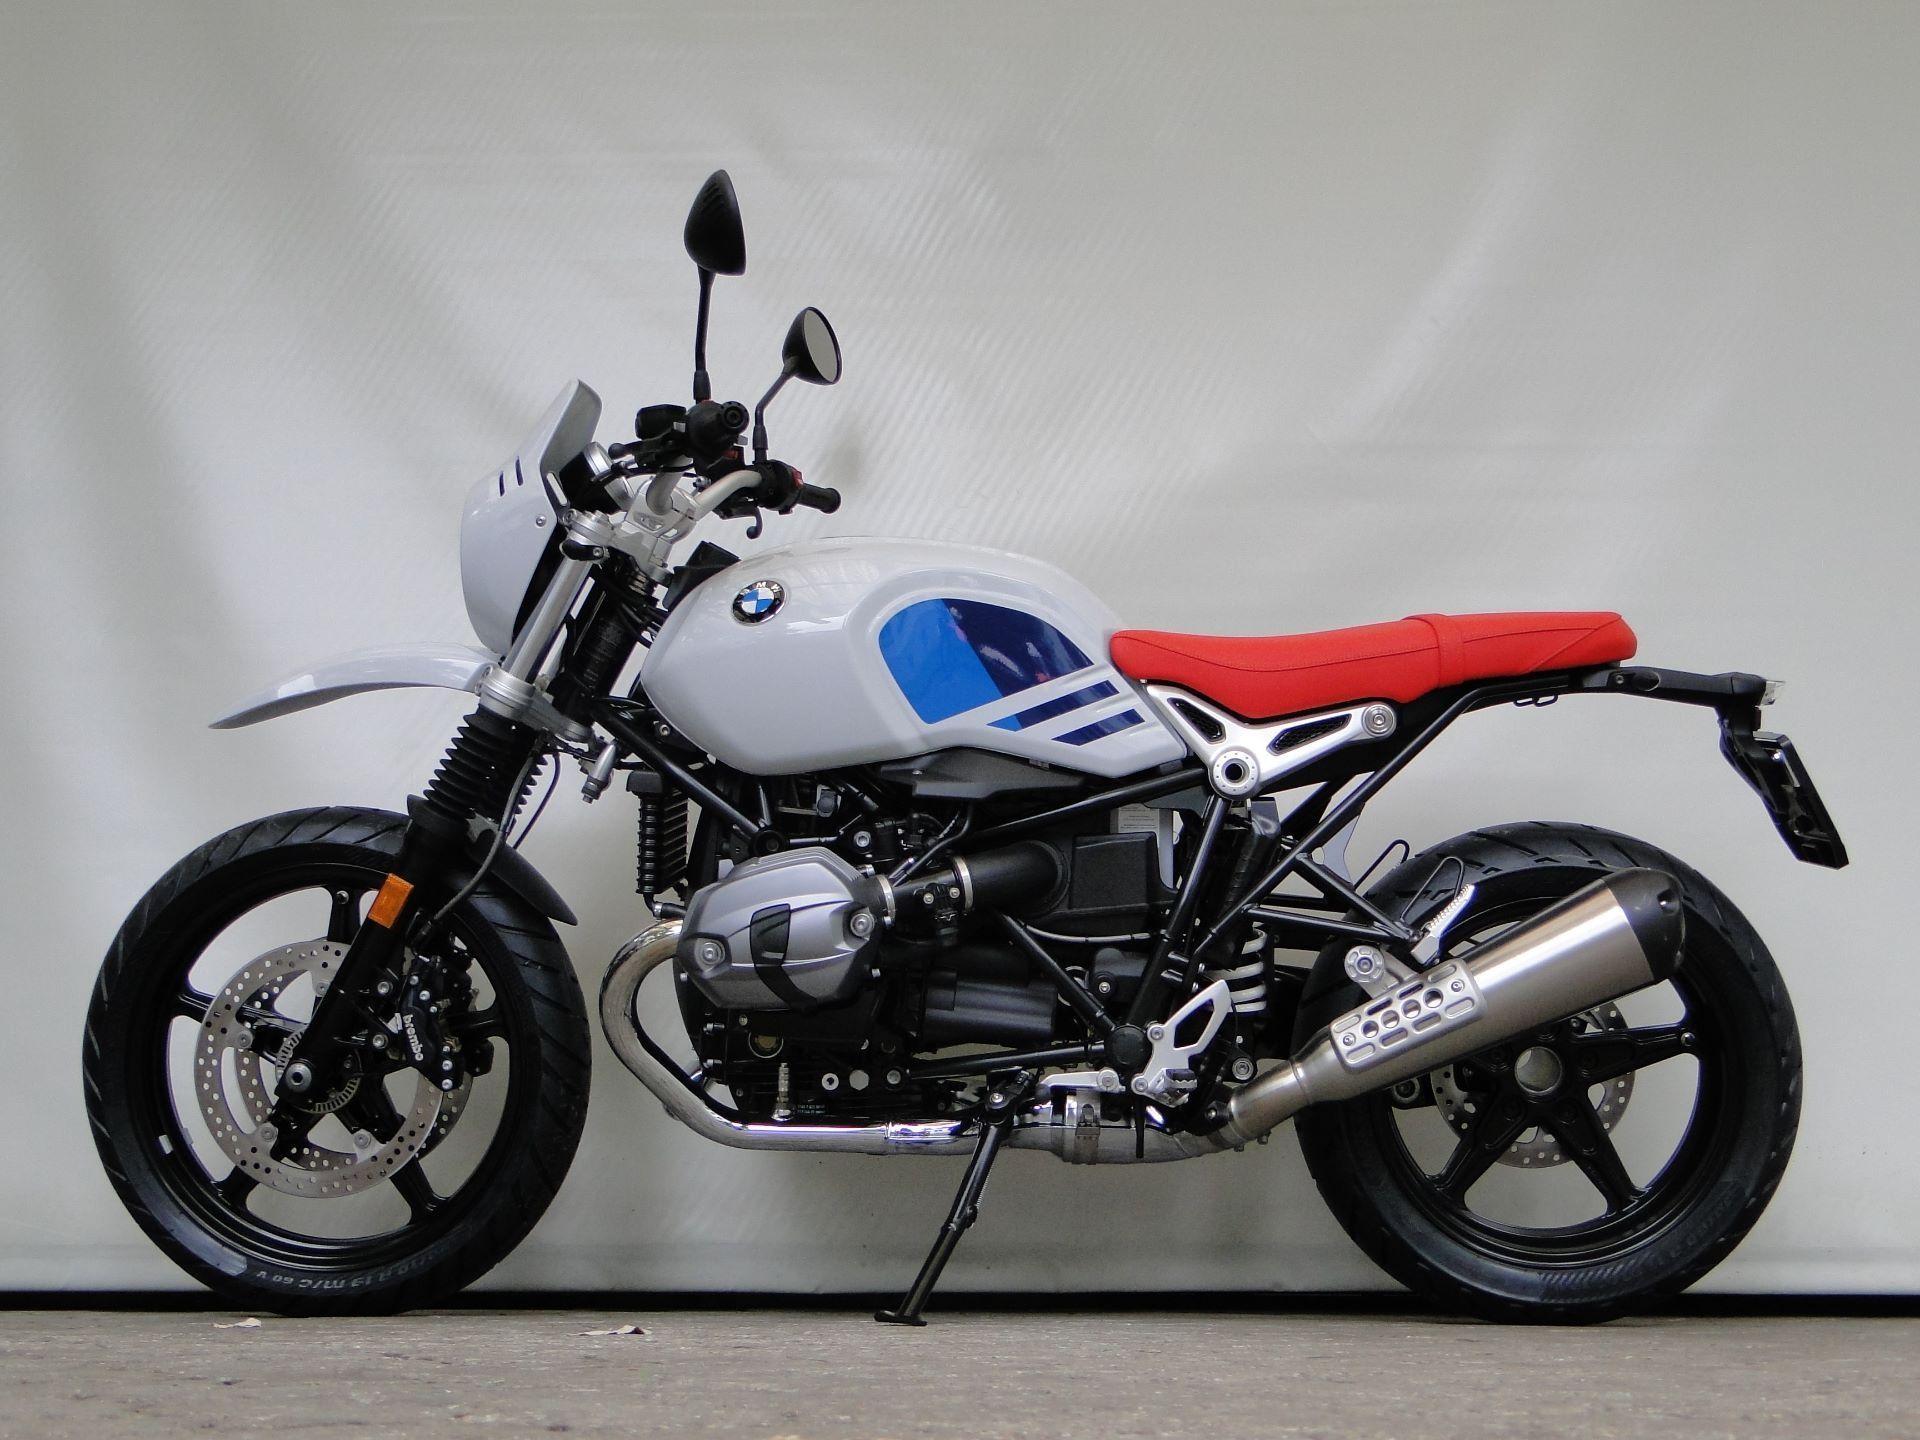 motorrad vorf hrmodell kaufen bmw r nine t urban g s neufahrzeug hobi moto ag winterthur. Black Bedroom Furniture Sets. Home Design Ideas